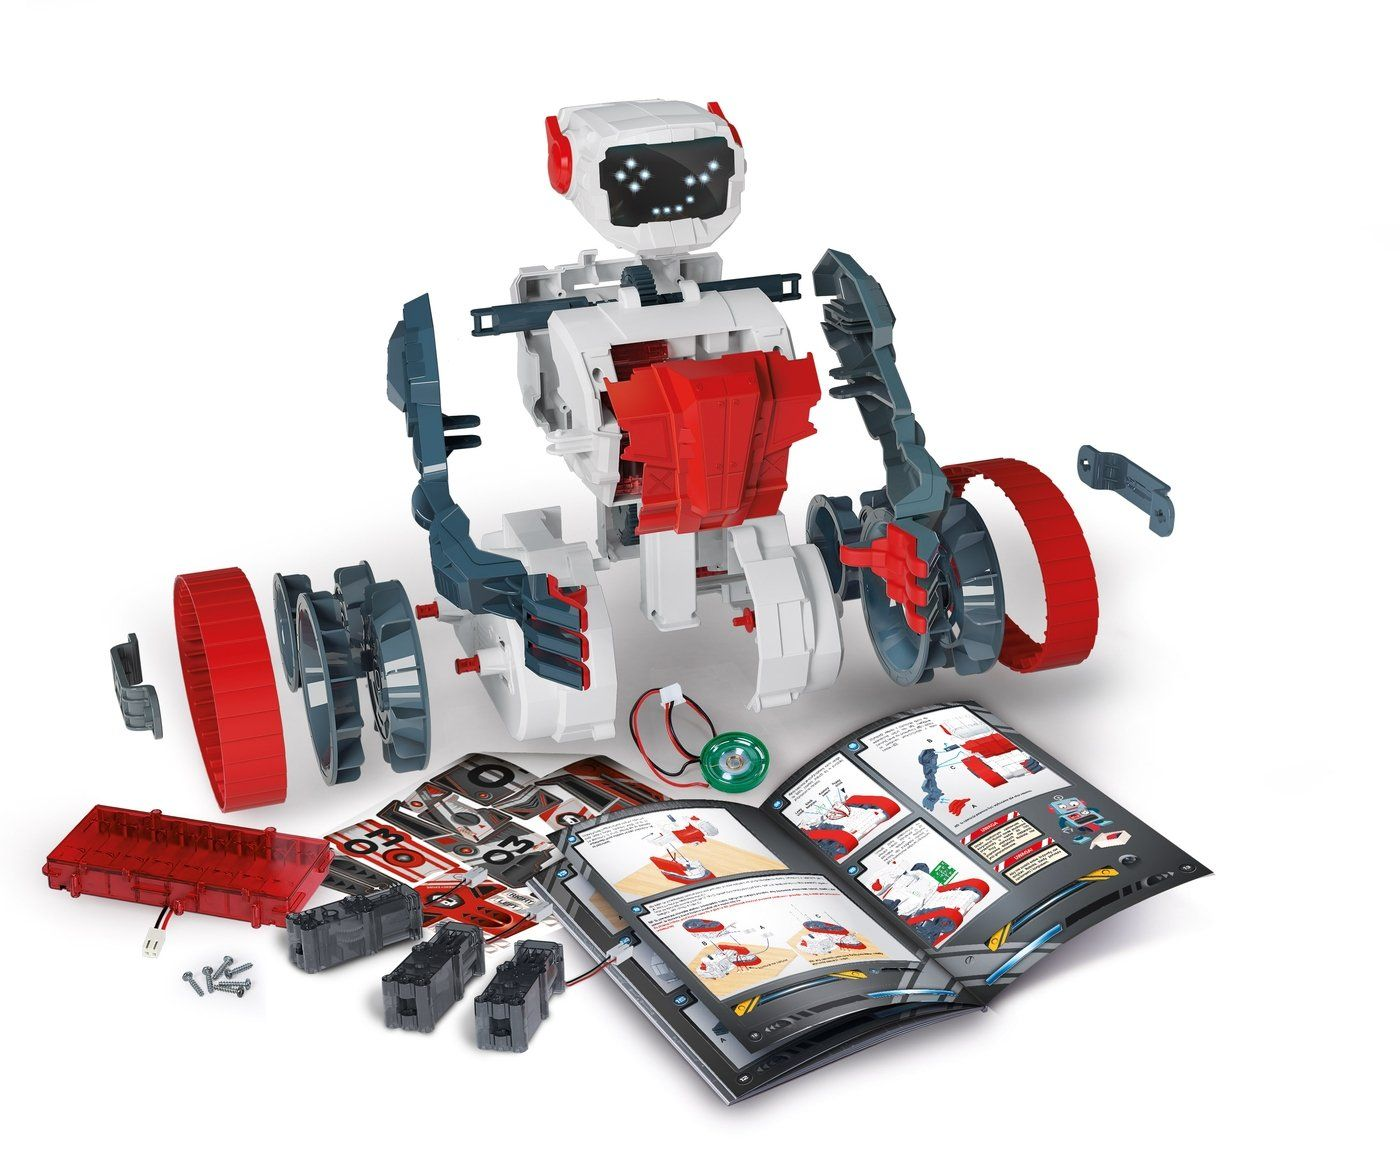 179f8648a094 Zabawki na prezent Programowalny Robot Evolution - Clementoni ...